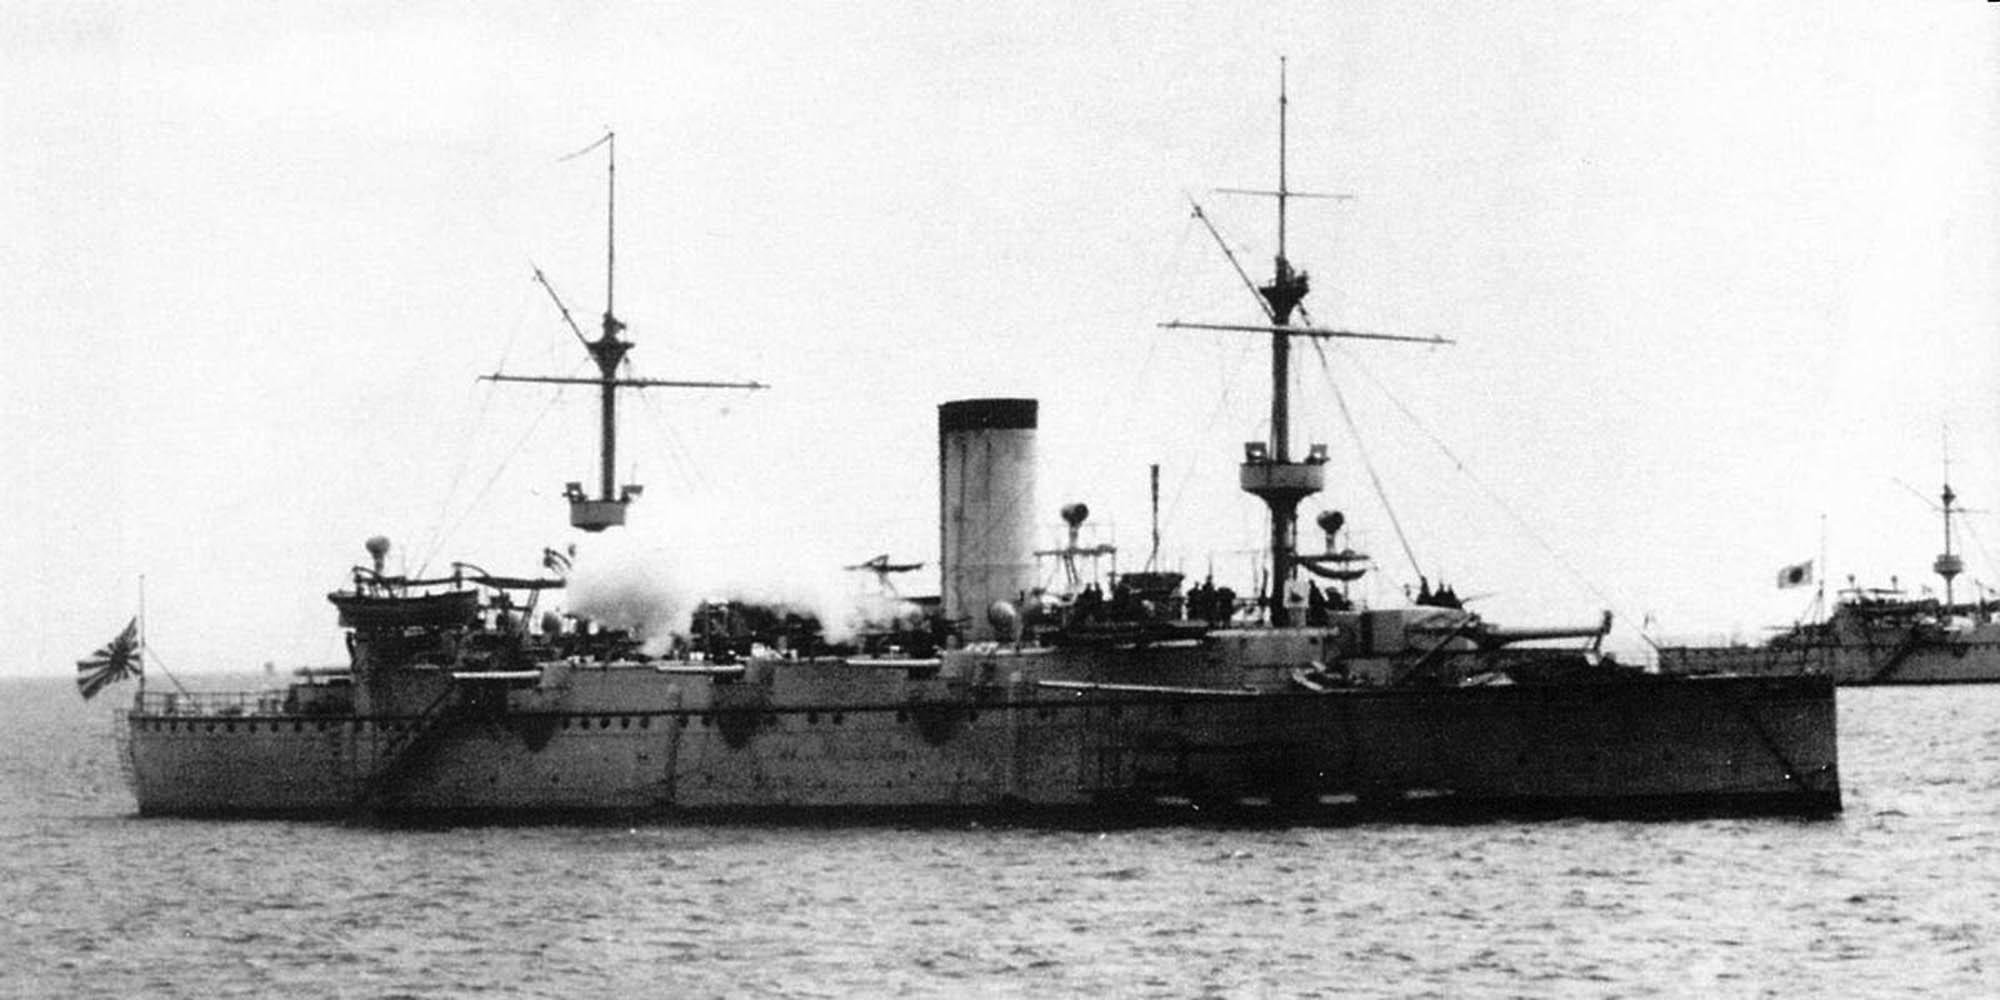 Naniwa class protected cruisers (1885)